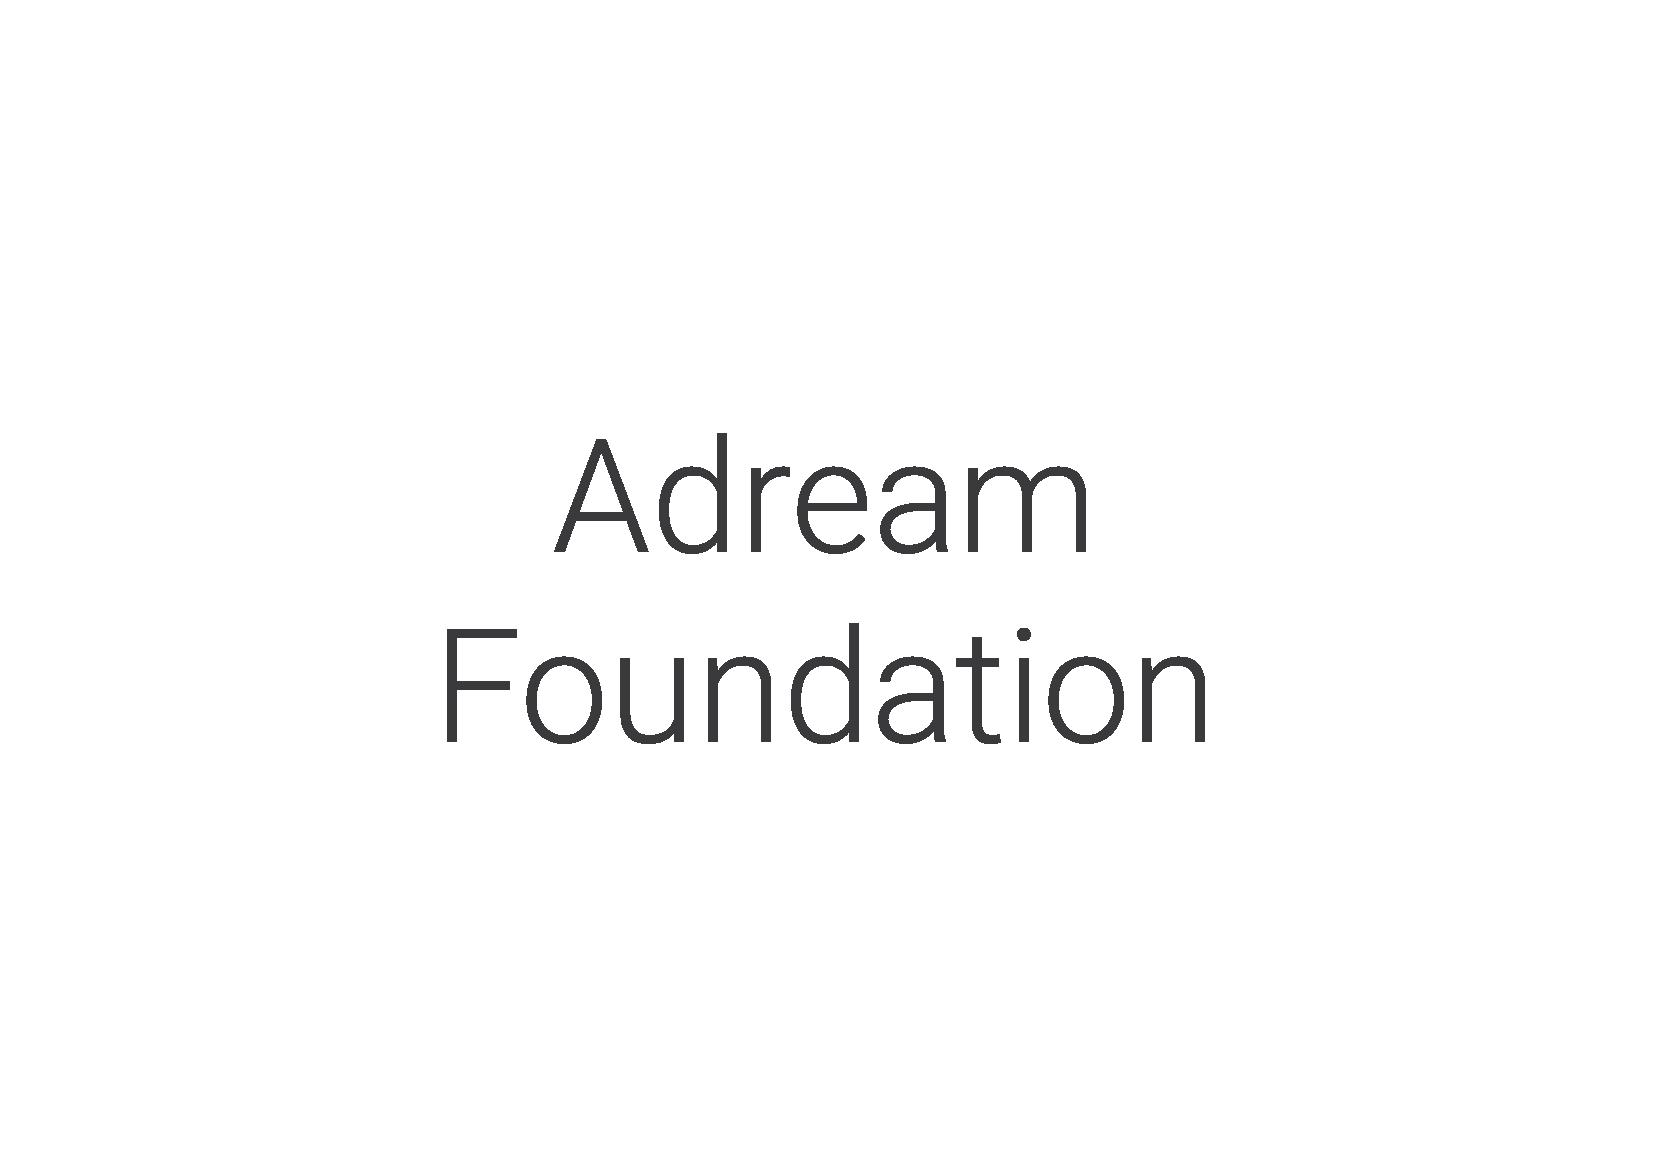 Adream Foundation